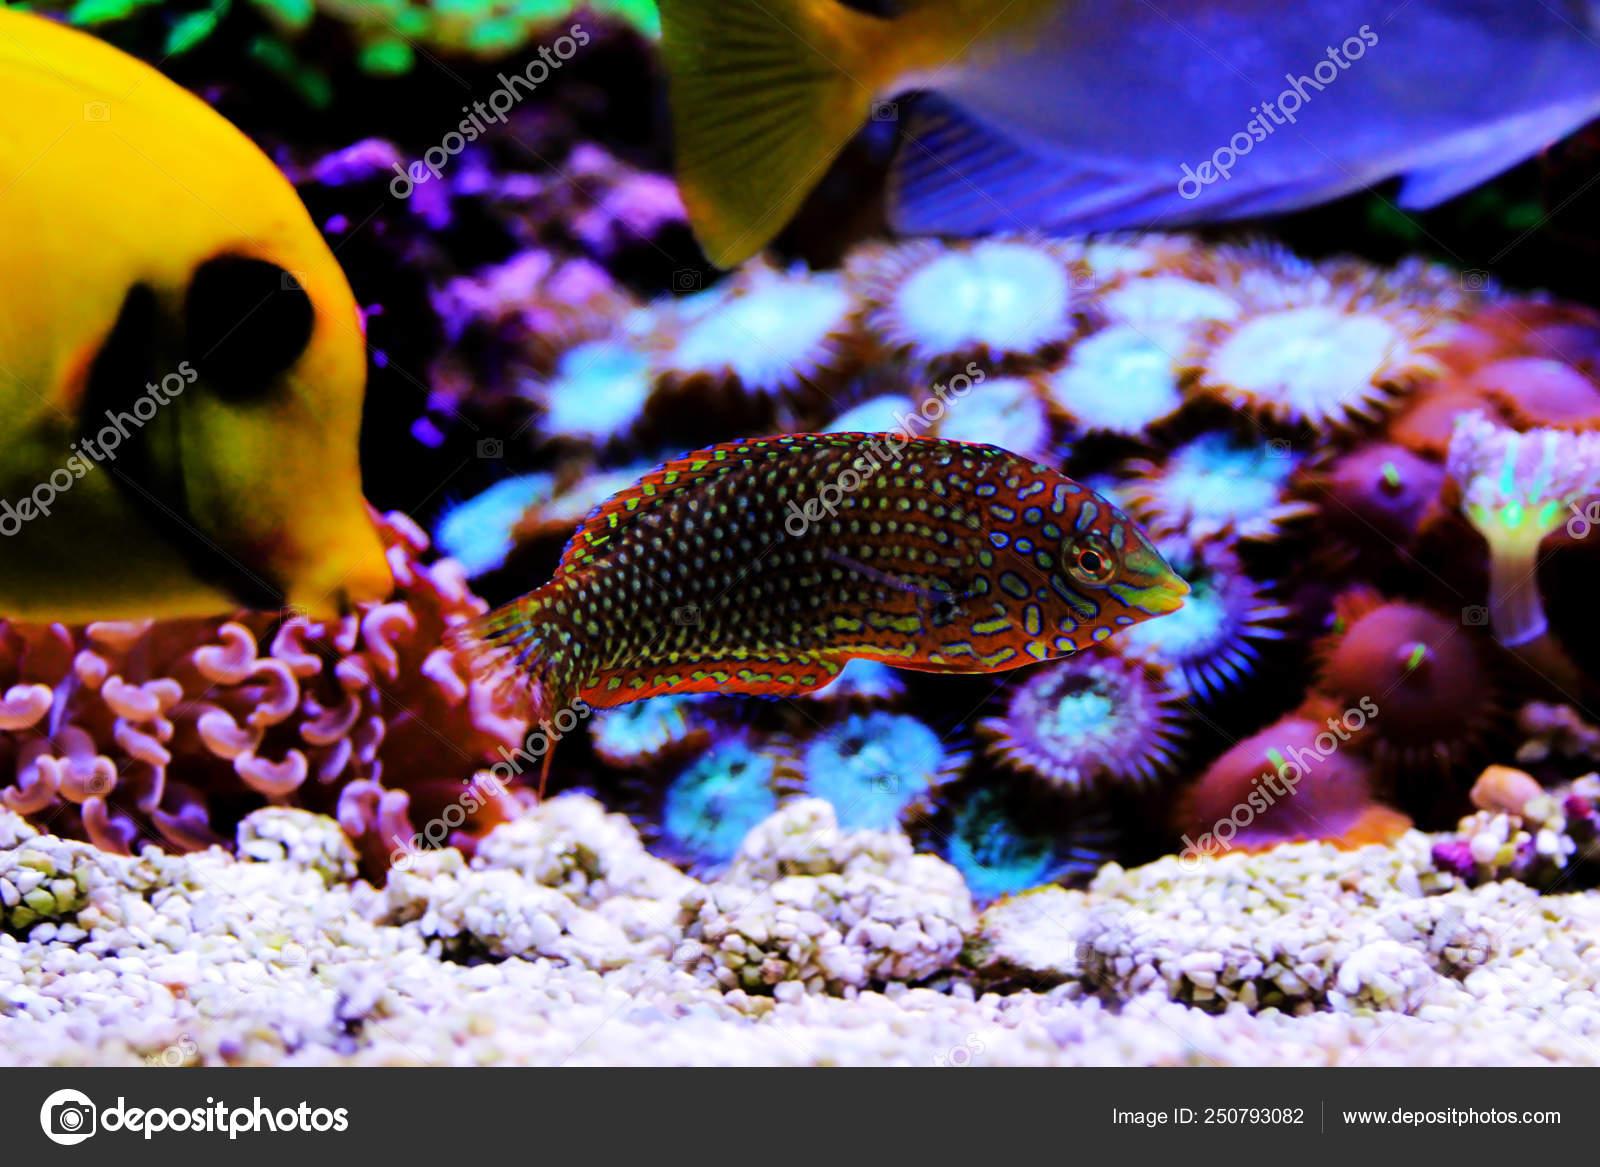 Ornate Leopard Wrasse Fish Coral Reef Aquarium Tank — Stock